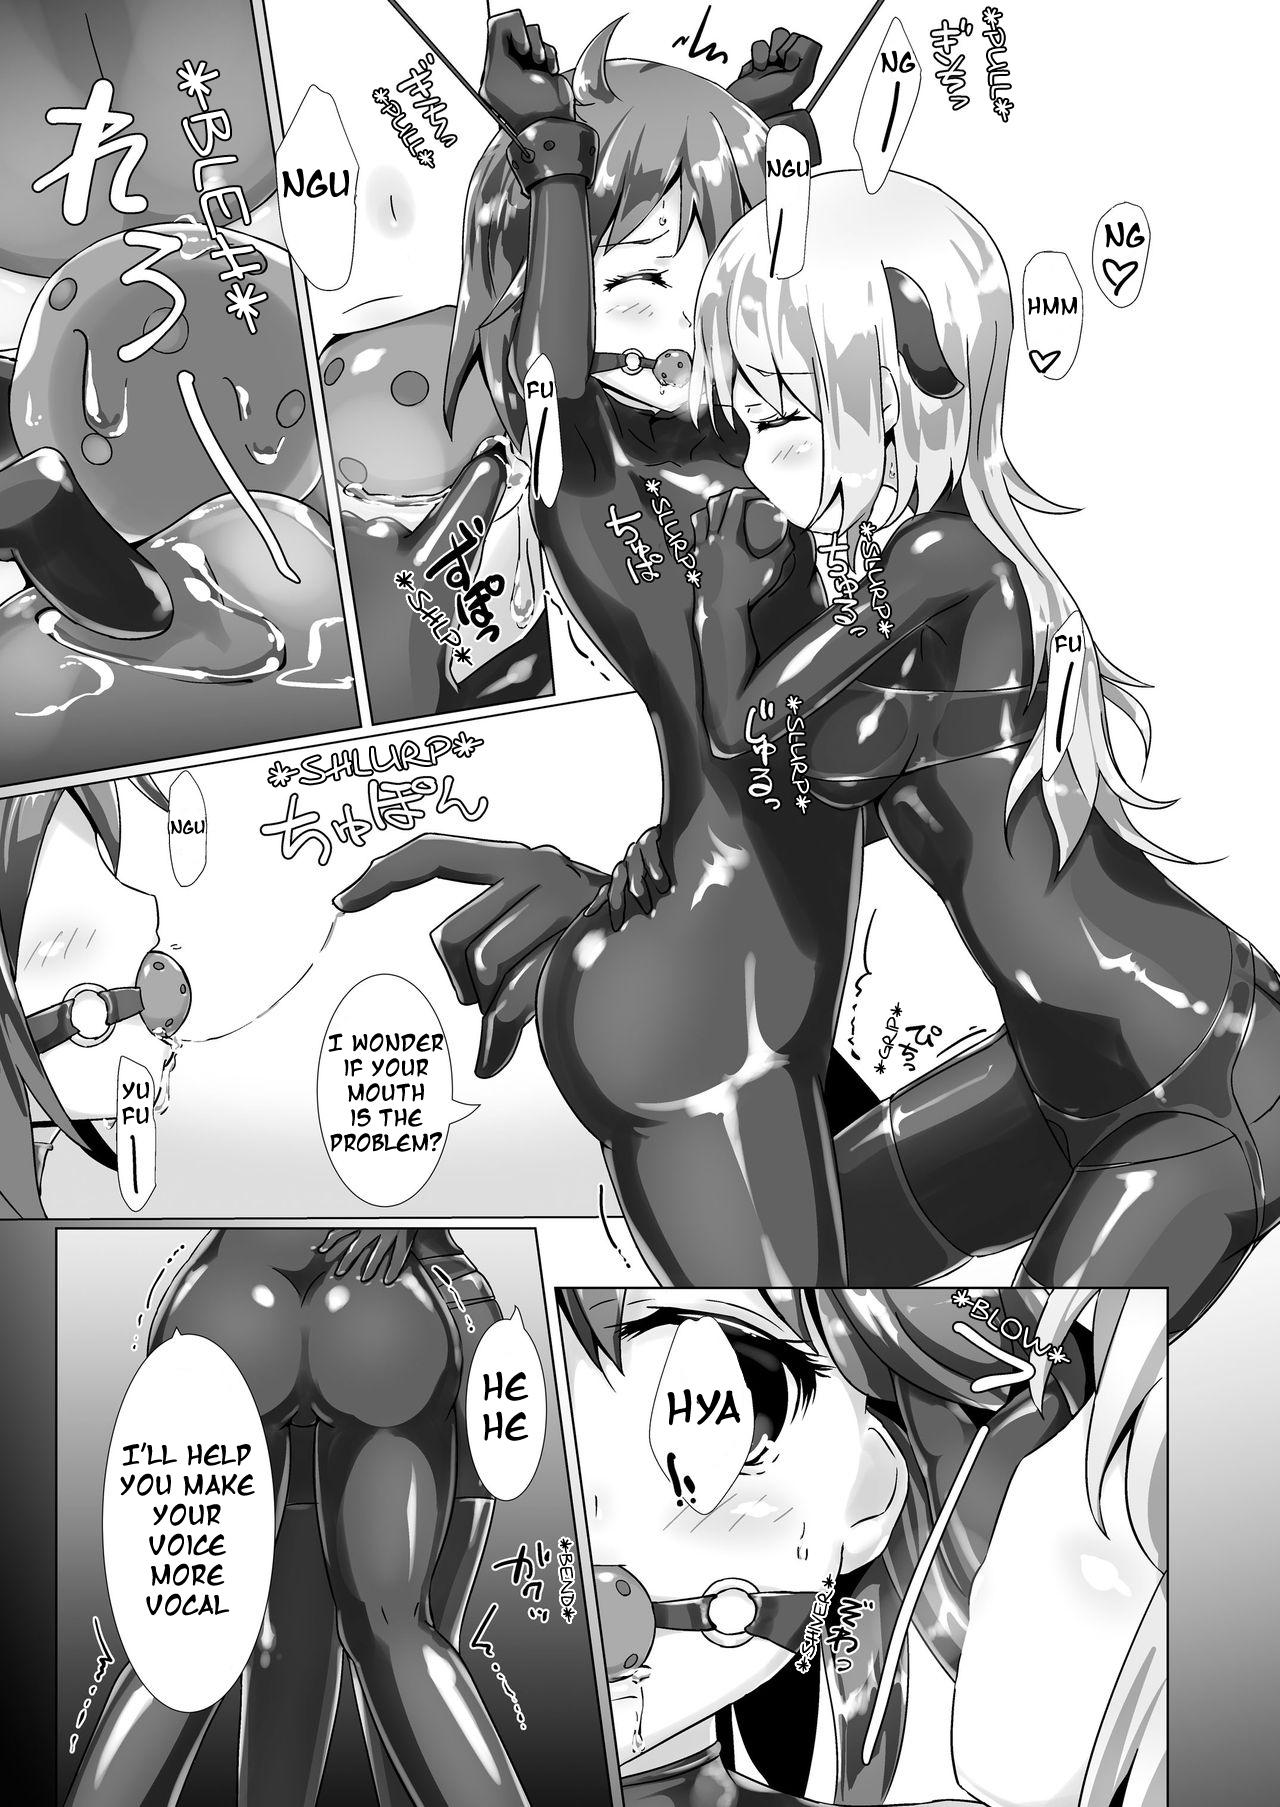 Yumewatari no Mistress 16